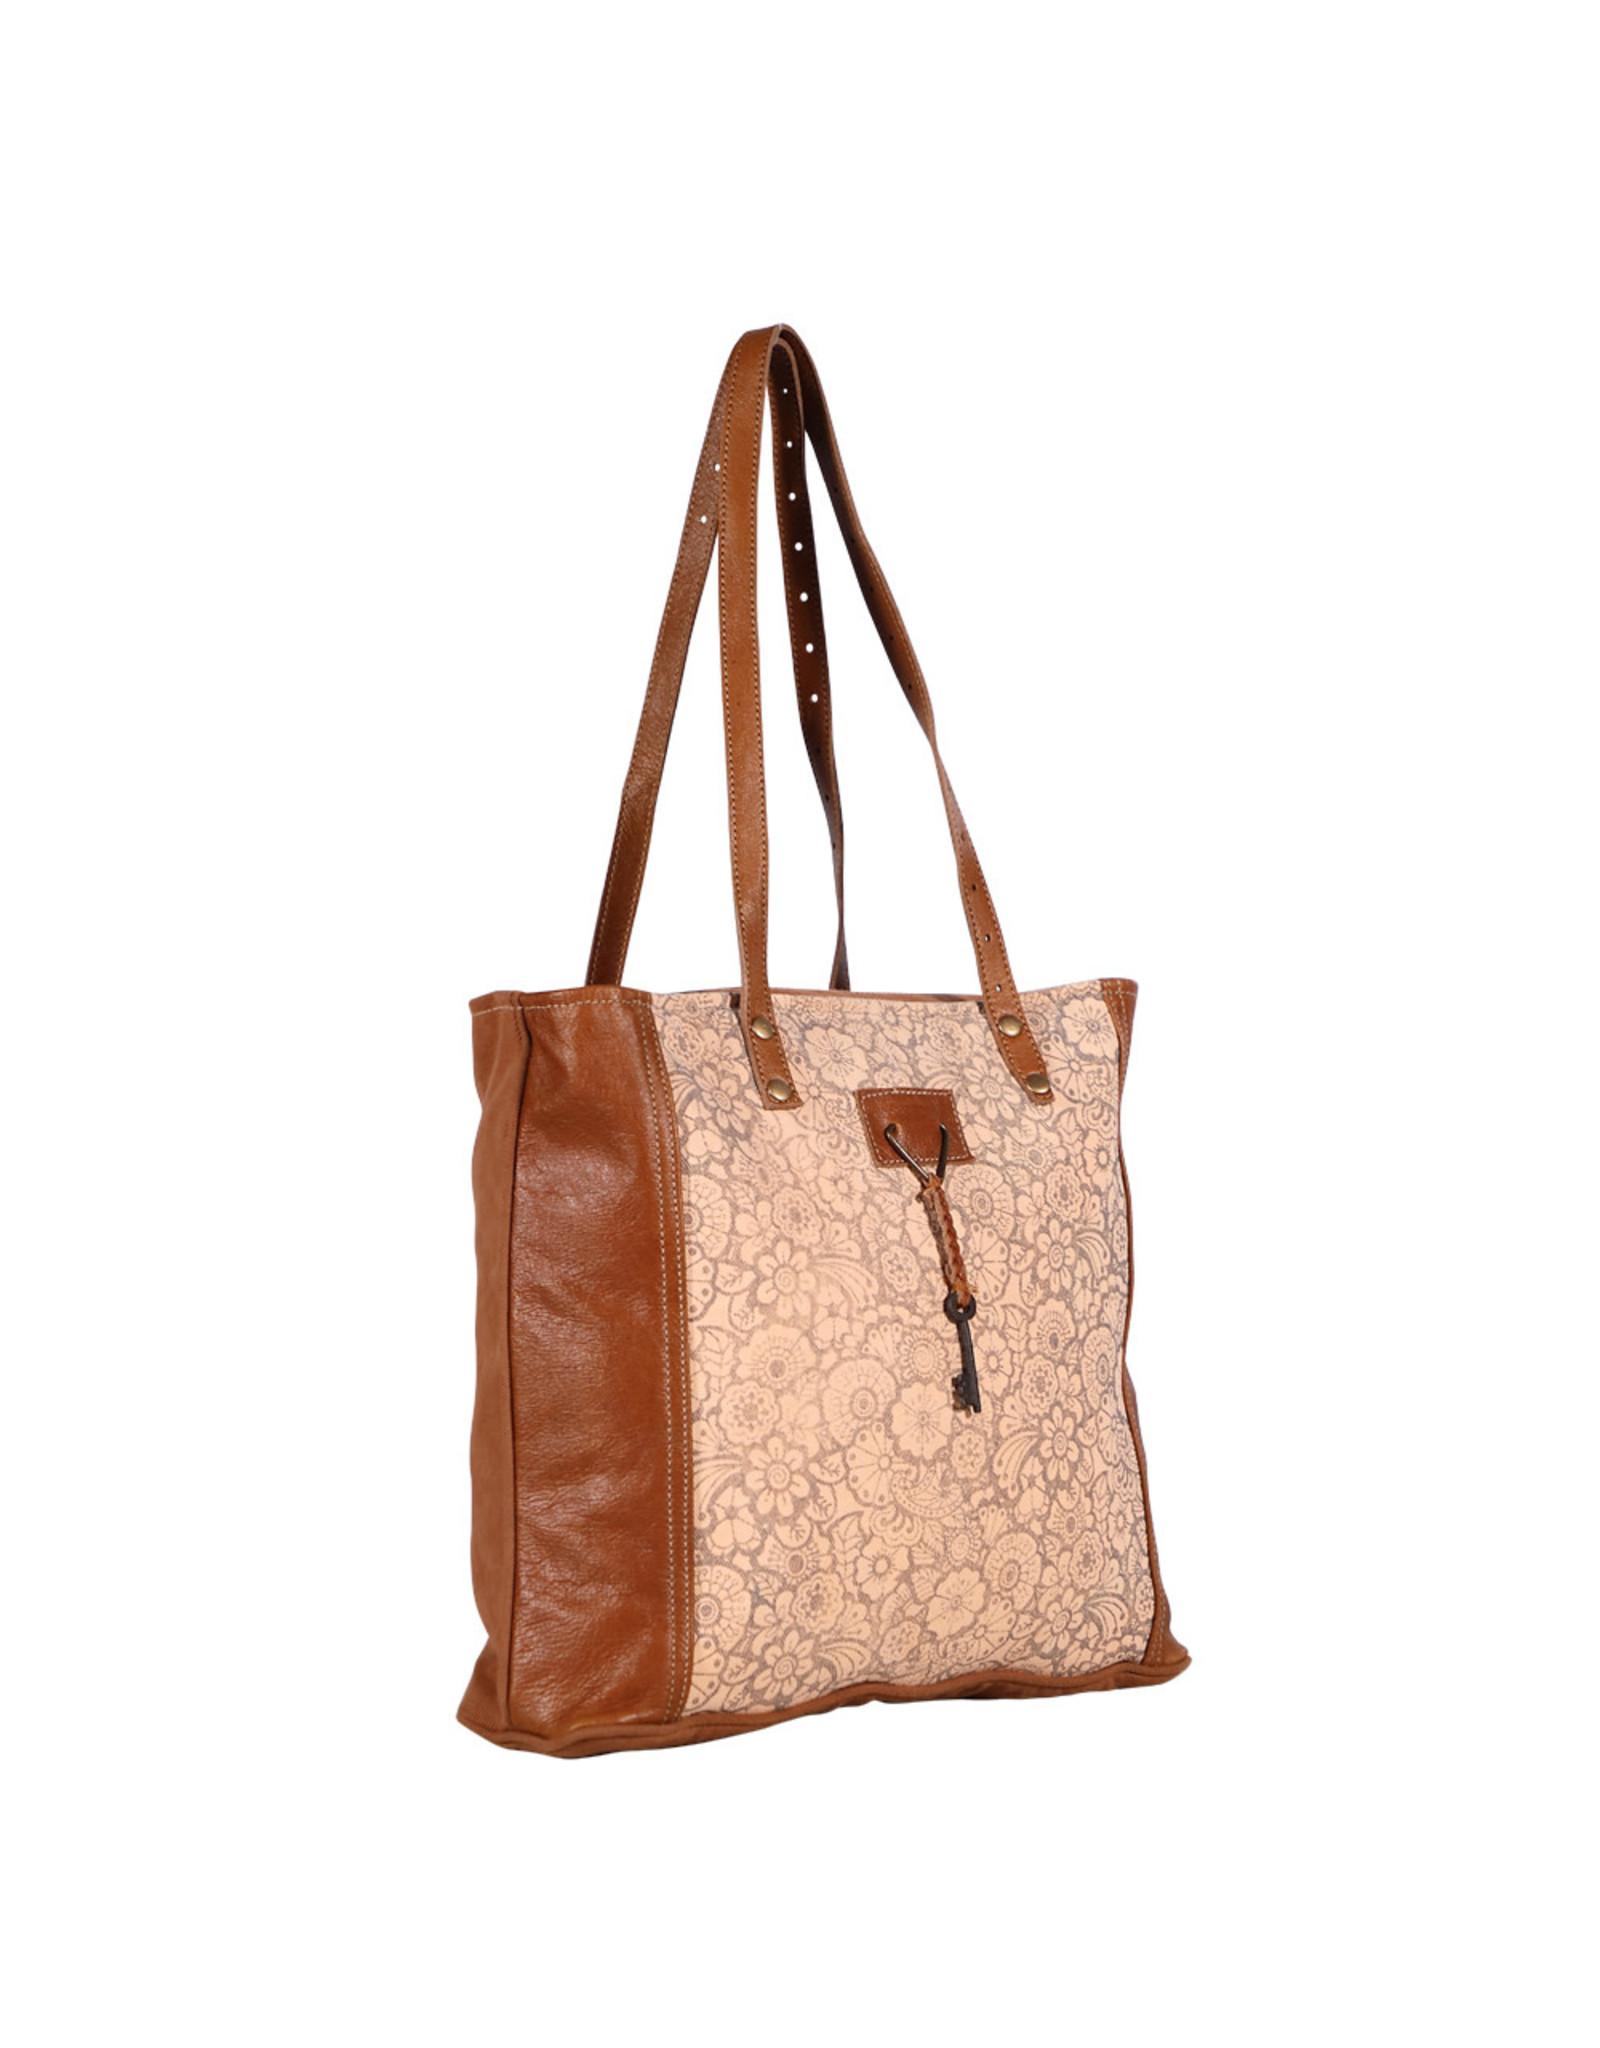 Myra Bags S-1961 Madame Tote Bag